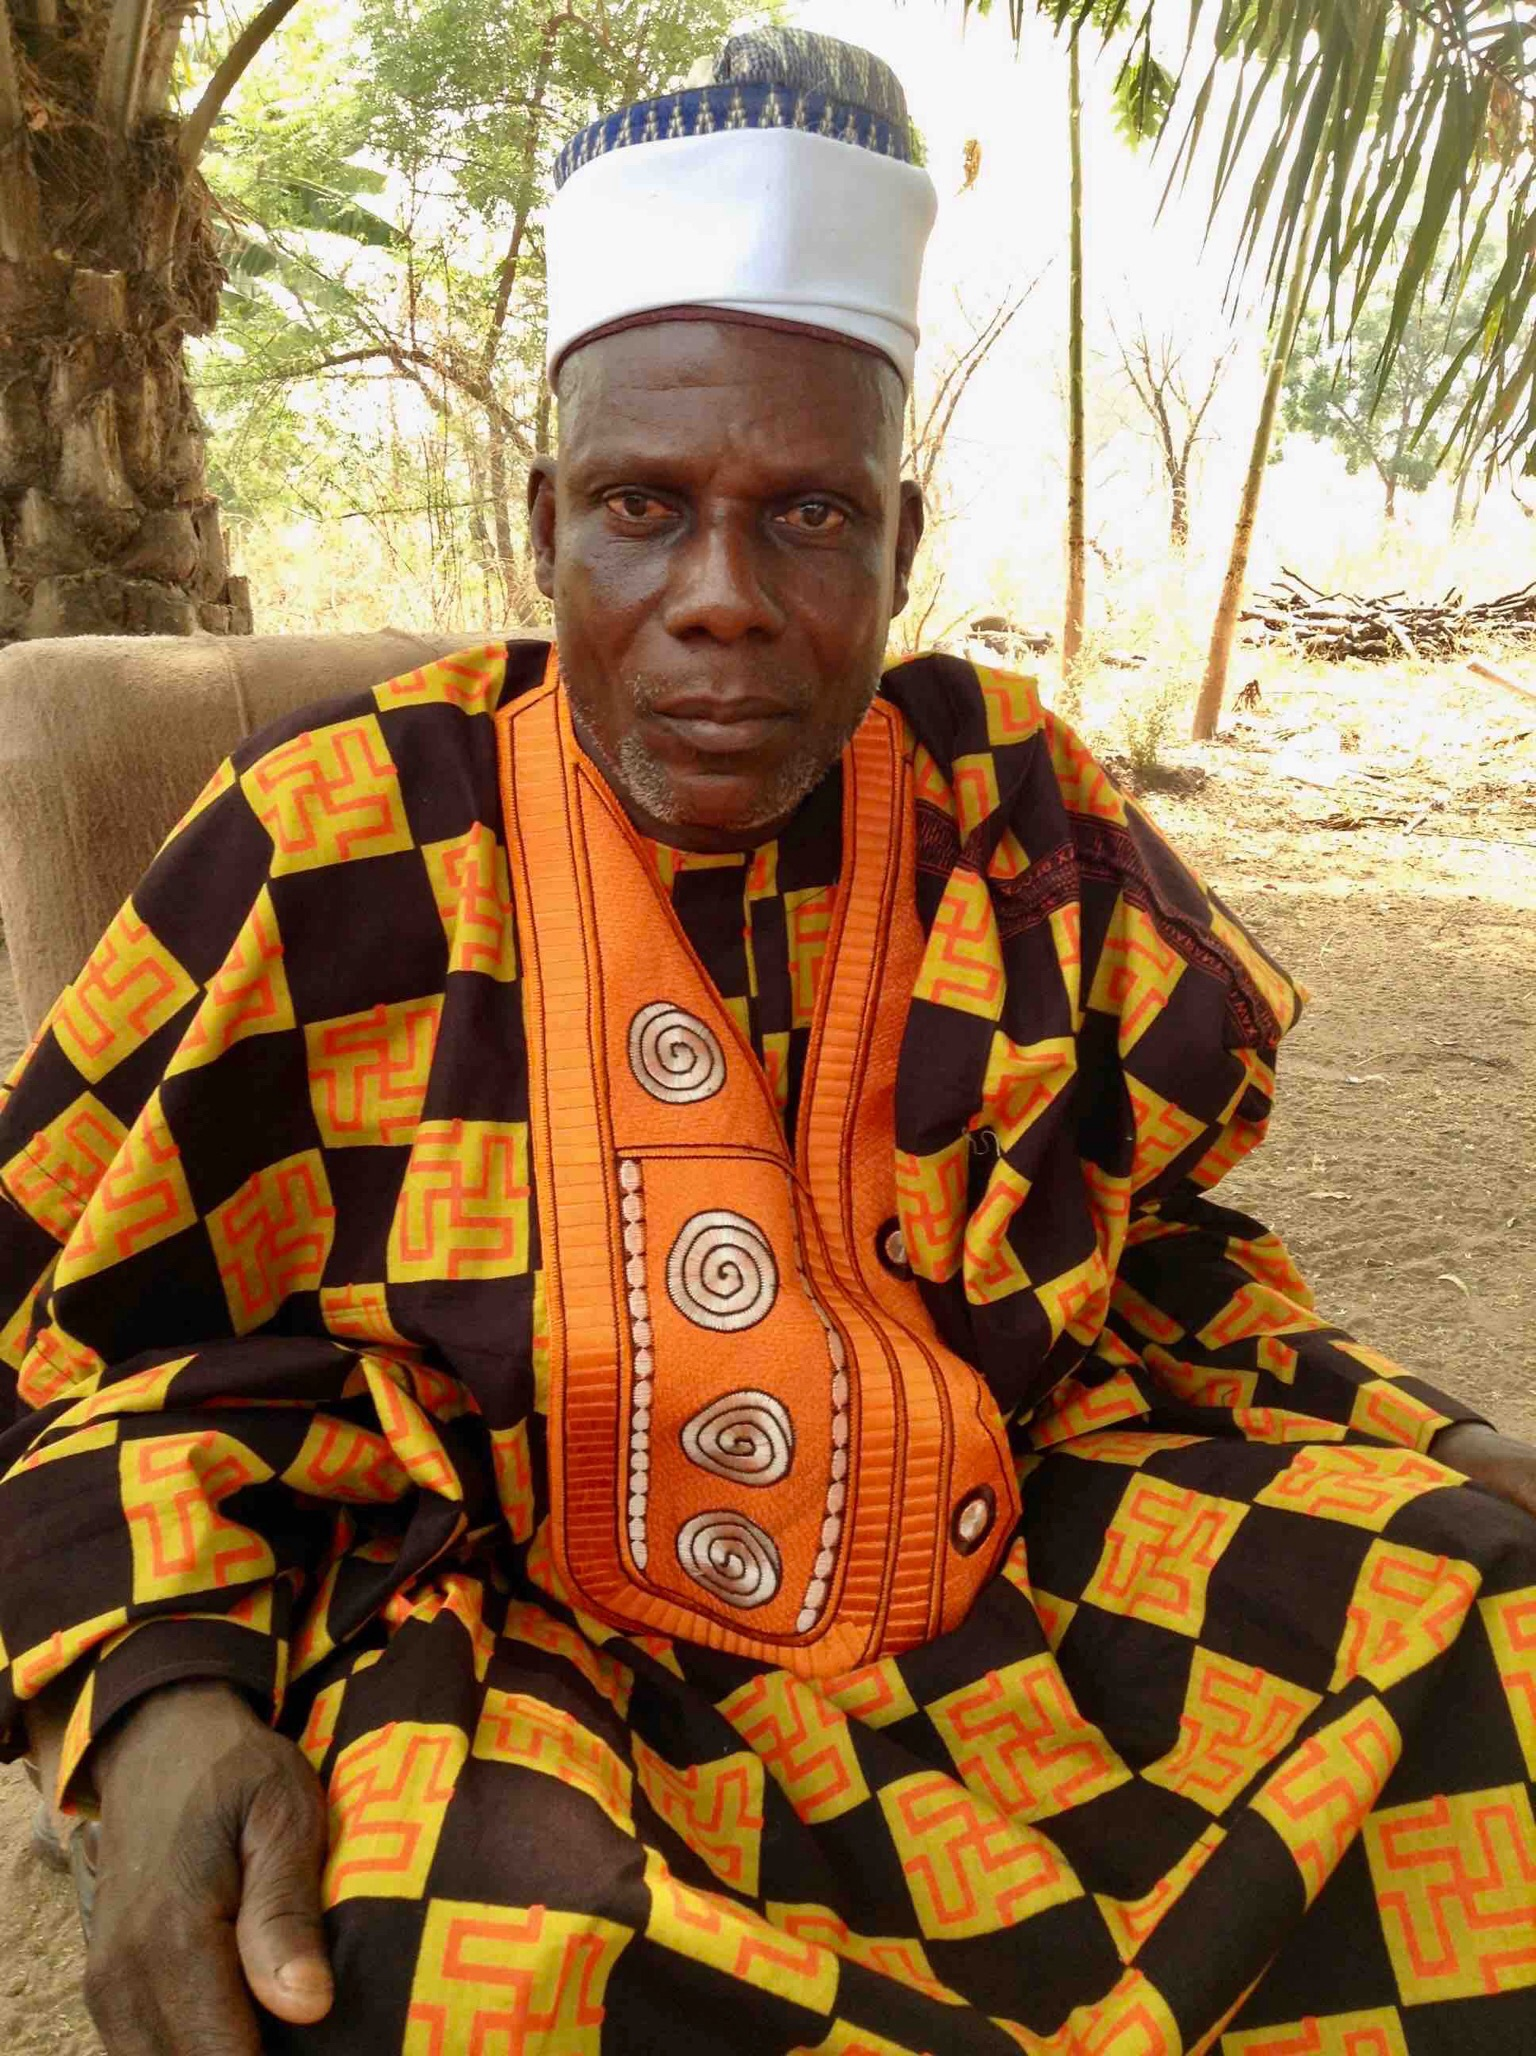 Wakili (King) of Langa Langa Village, Sunday Alu, Nasarawa State, Nigeria. #JujuFilms